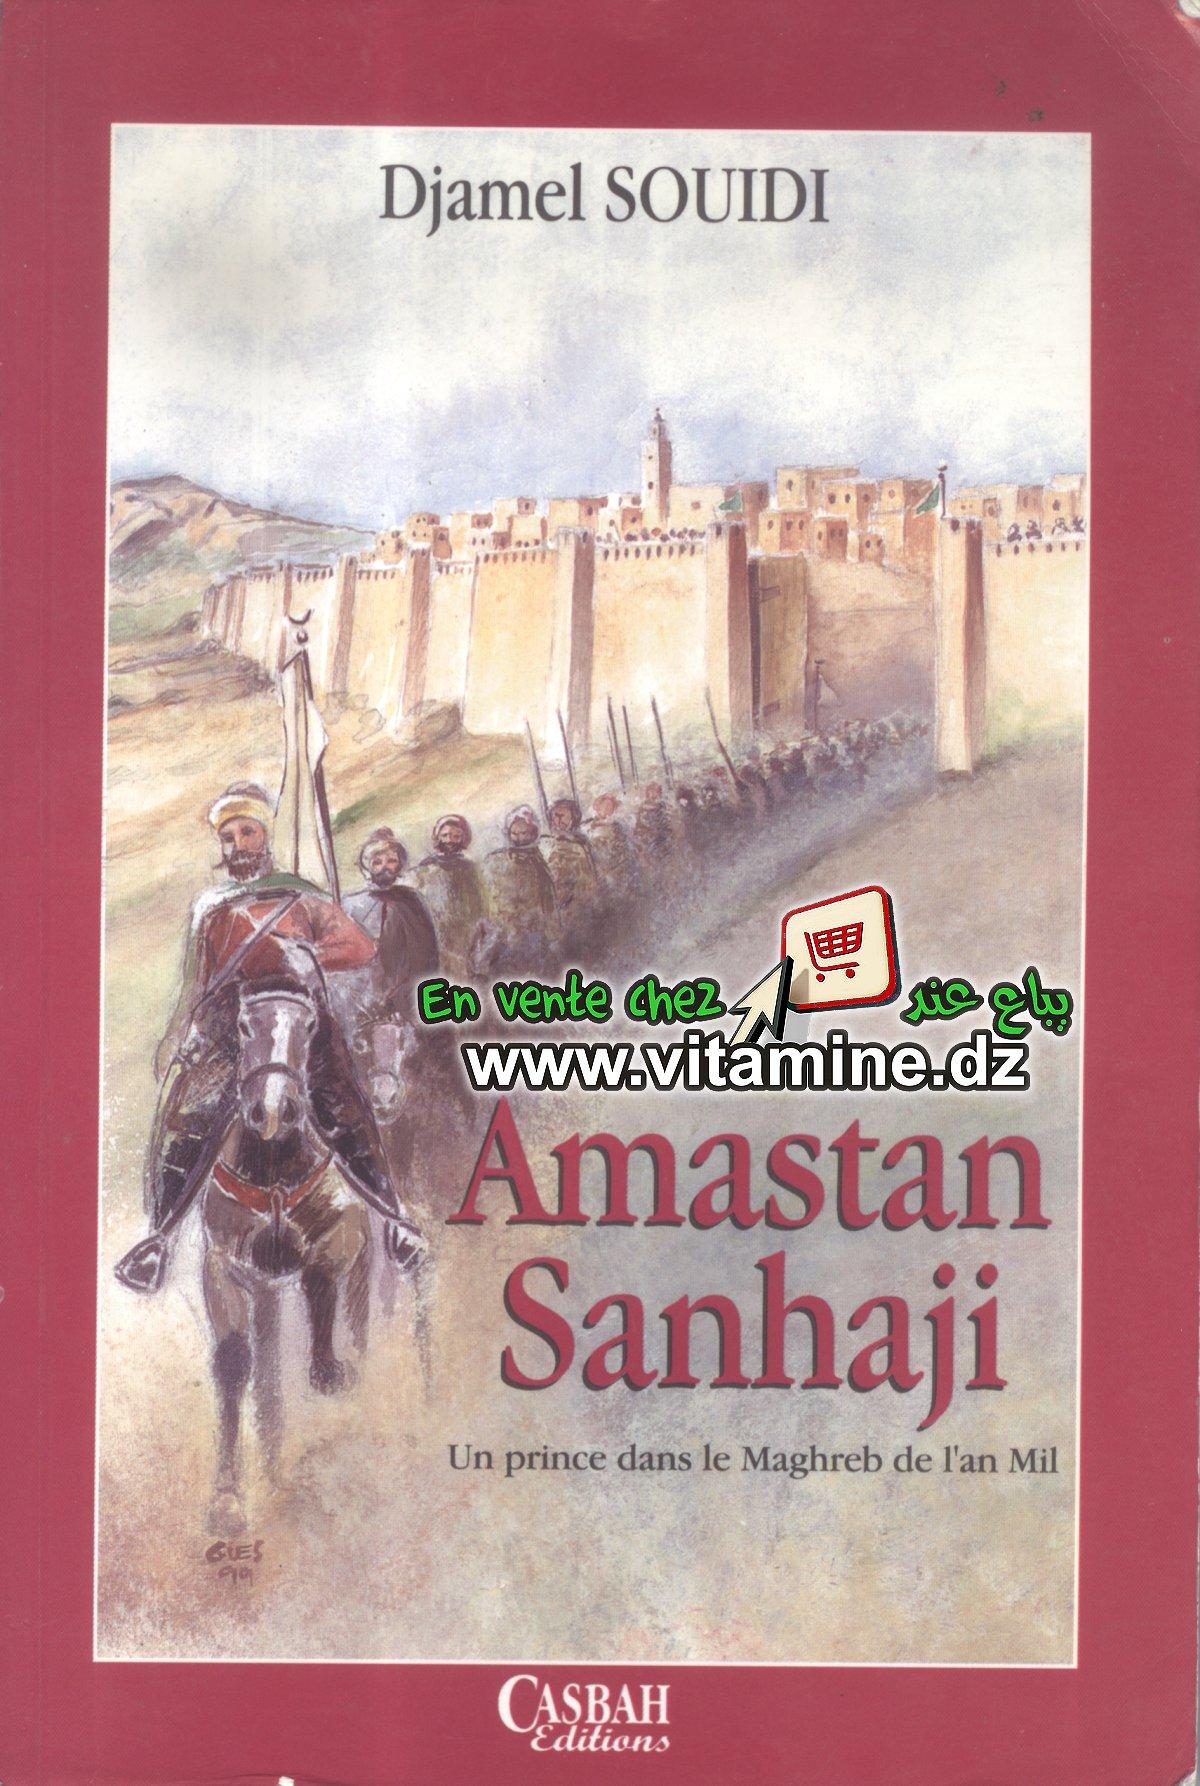 Djamel Souidi - Amastan Sanhaji